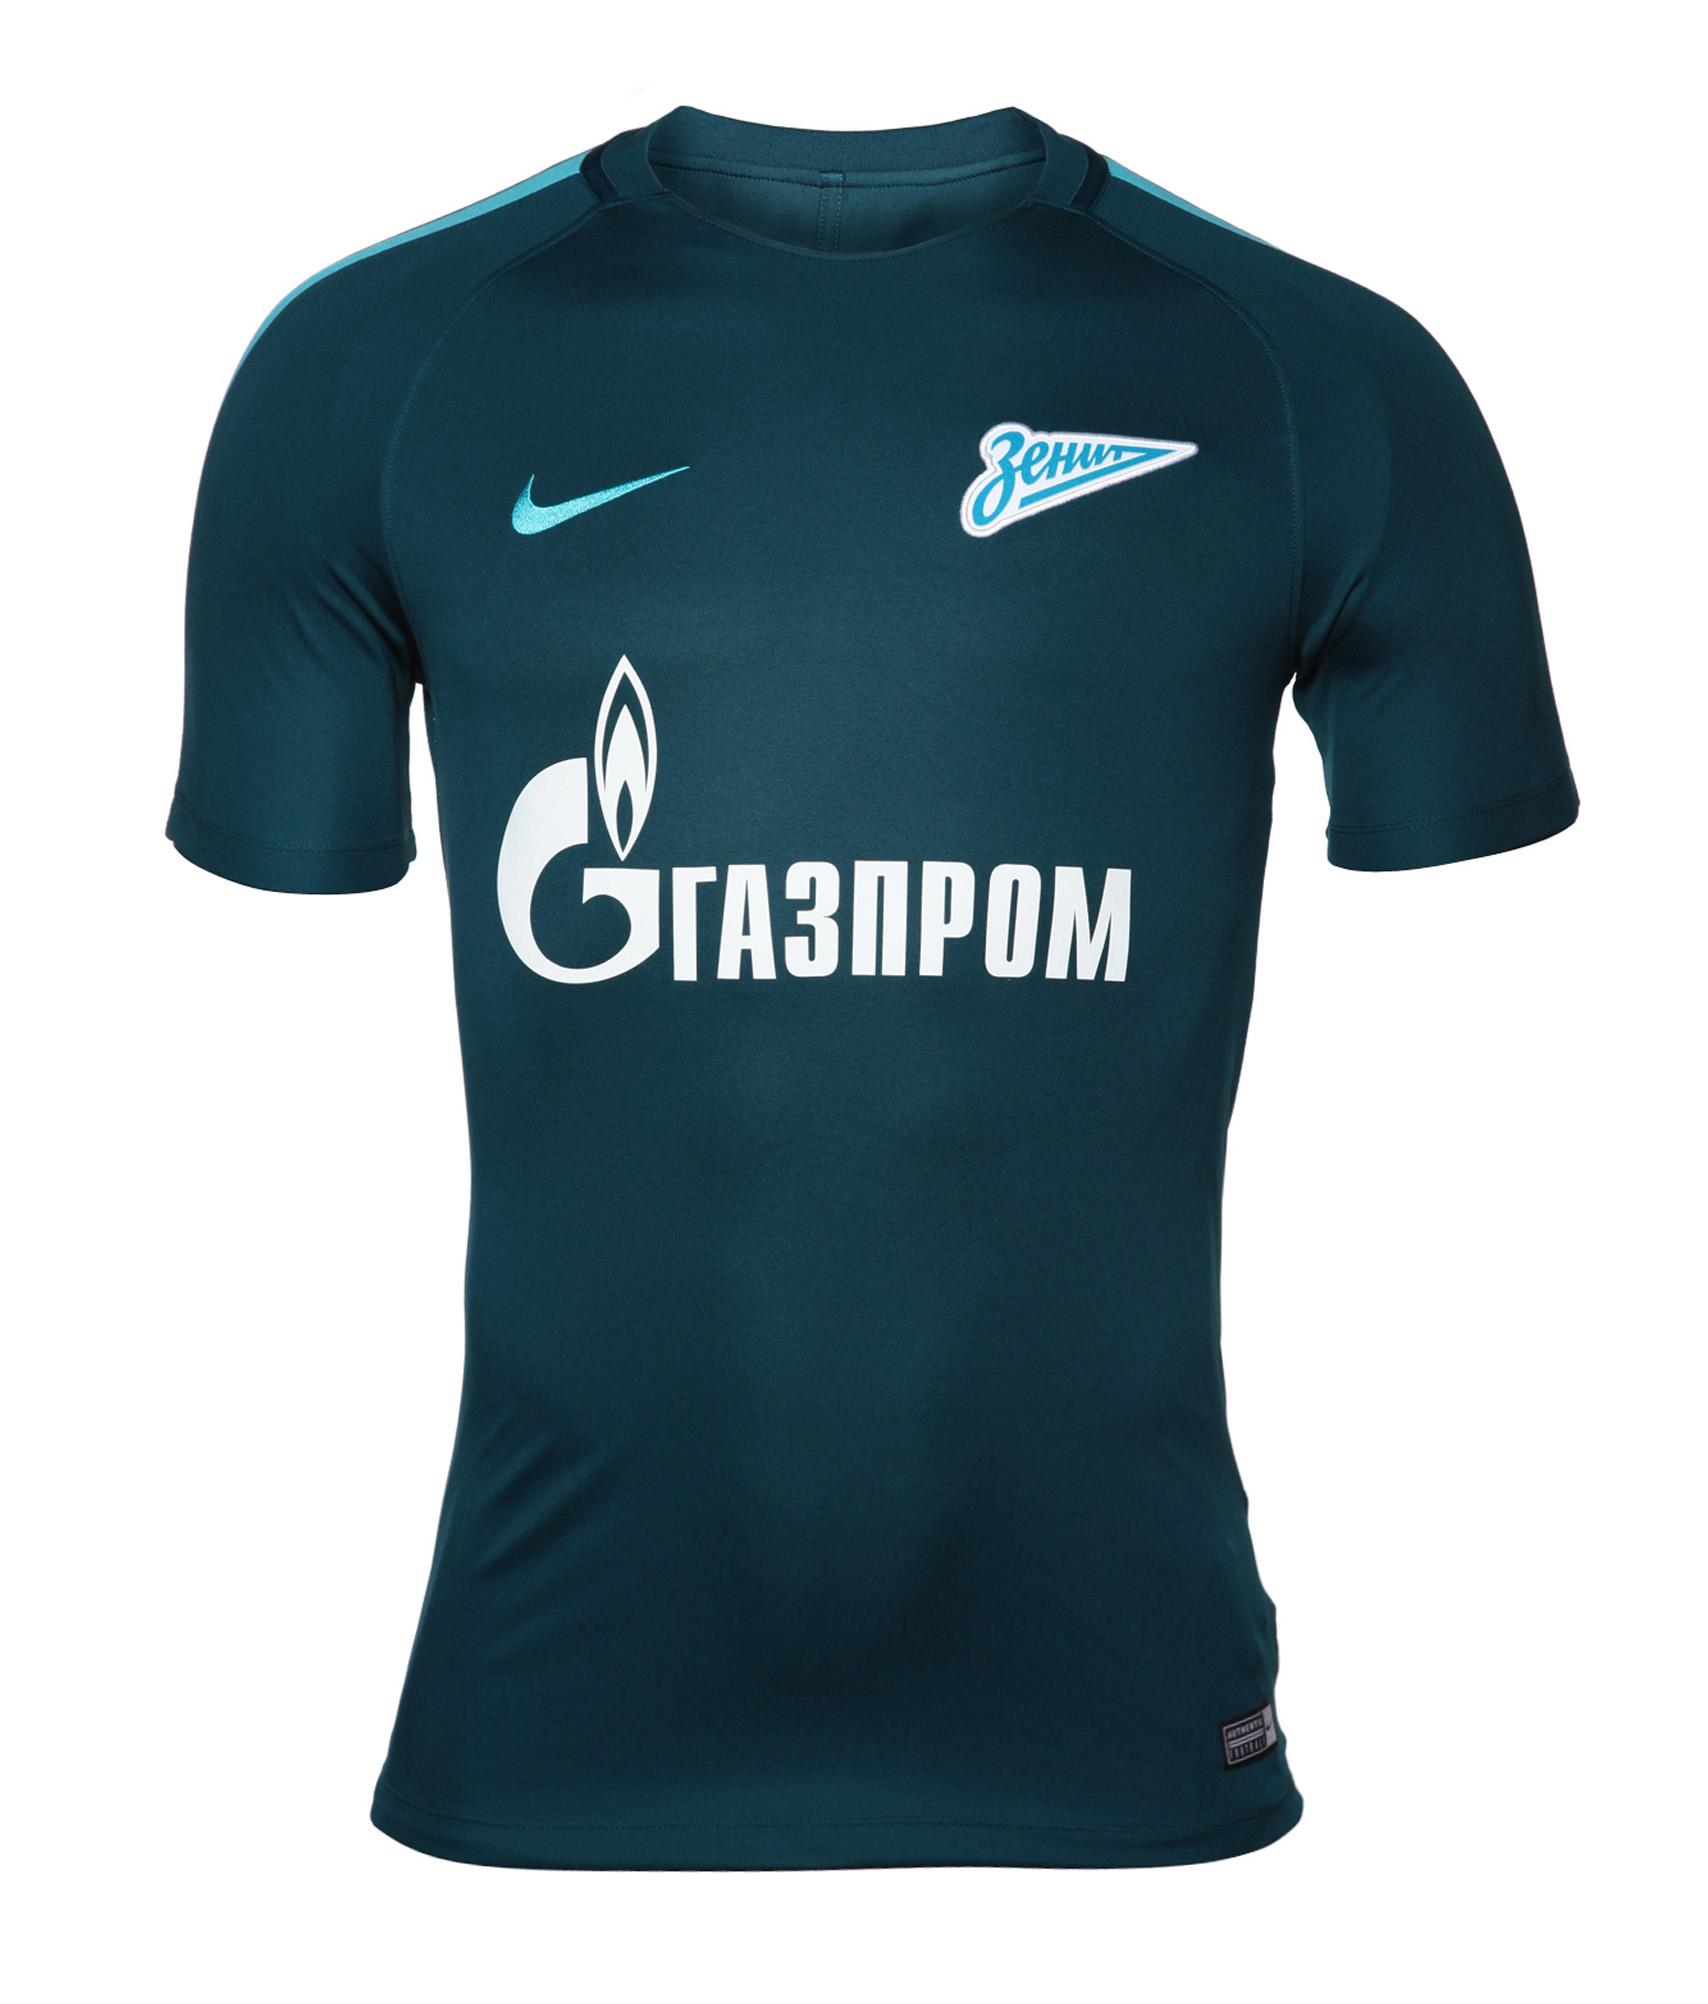 Футболка тренировочная Nike, Размер-XL футболка мужская nike cfc m nk dry sqd top ss cl цвет черный бирюзовый 905436 014 размер xl 52 54